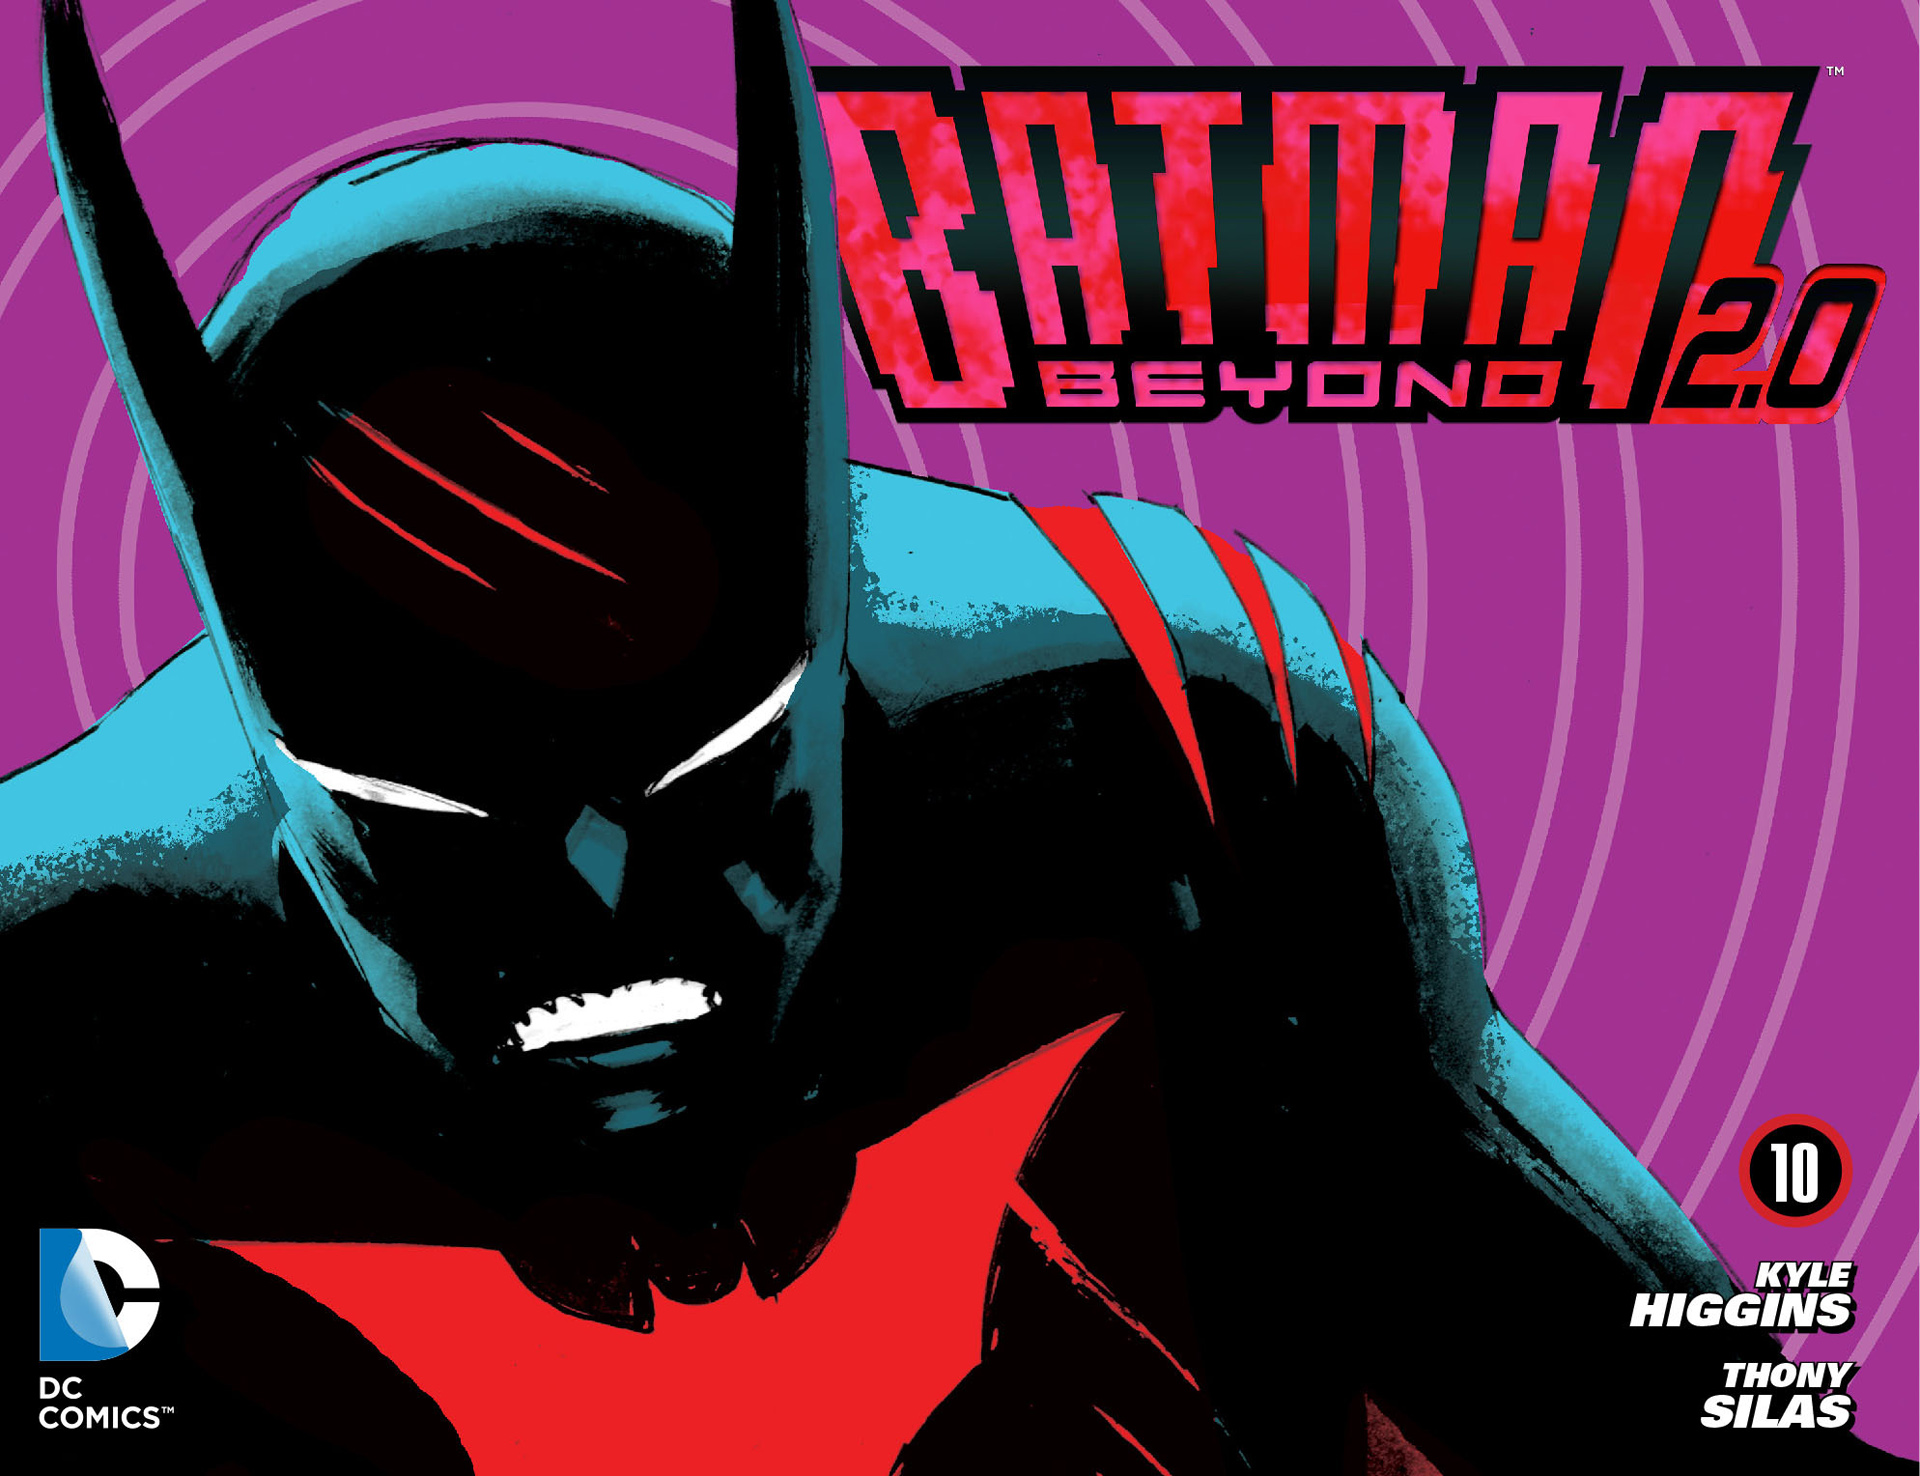 Batman Beyond 2.0 Issue #10 #10 - English 1